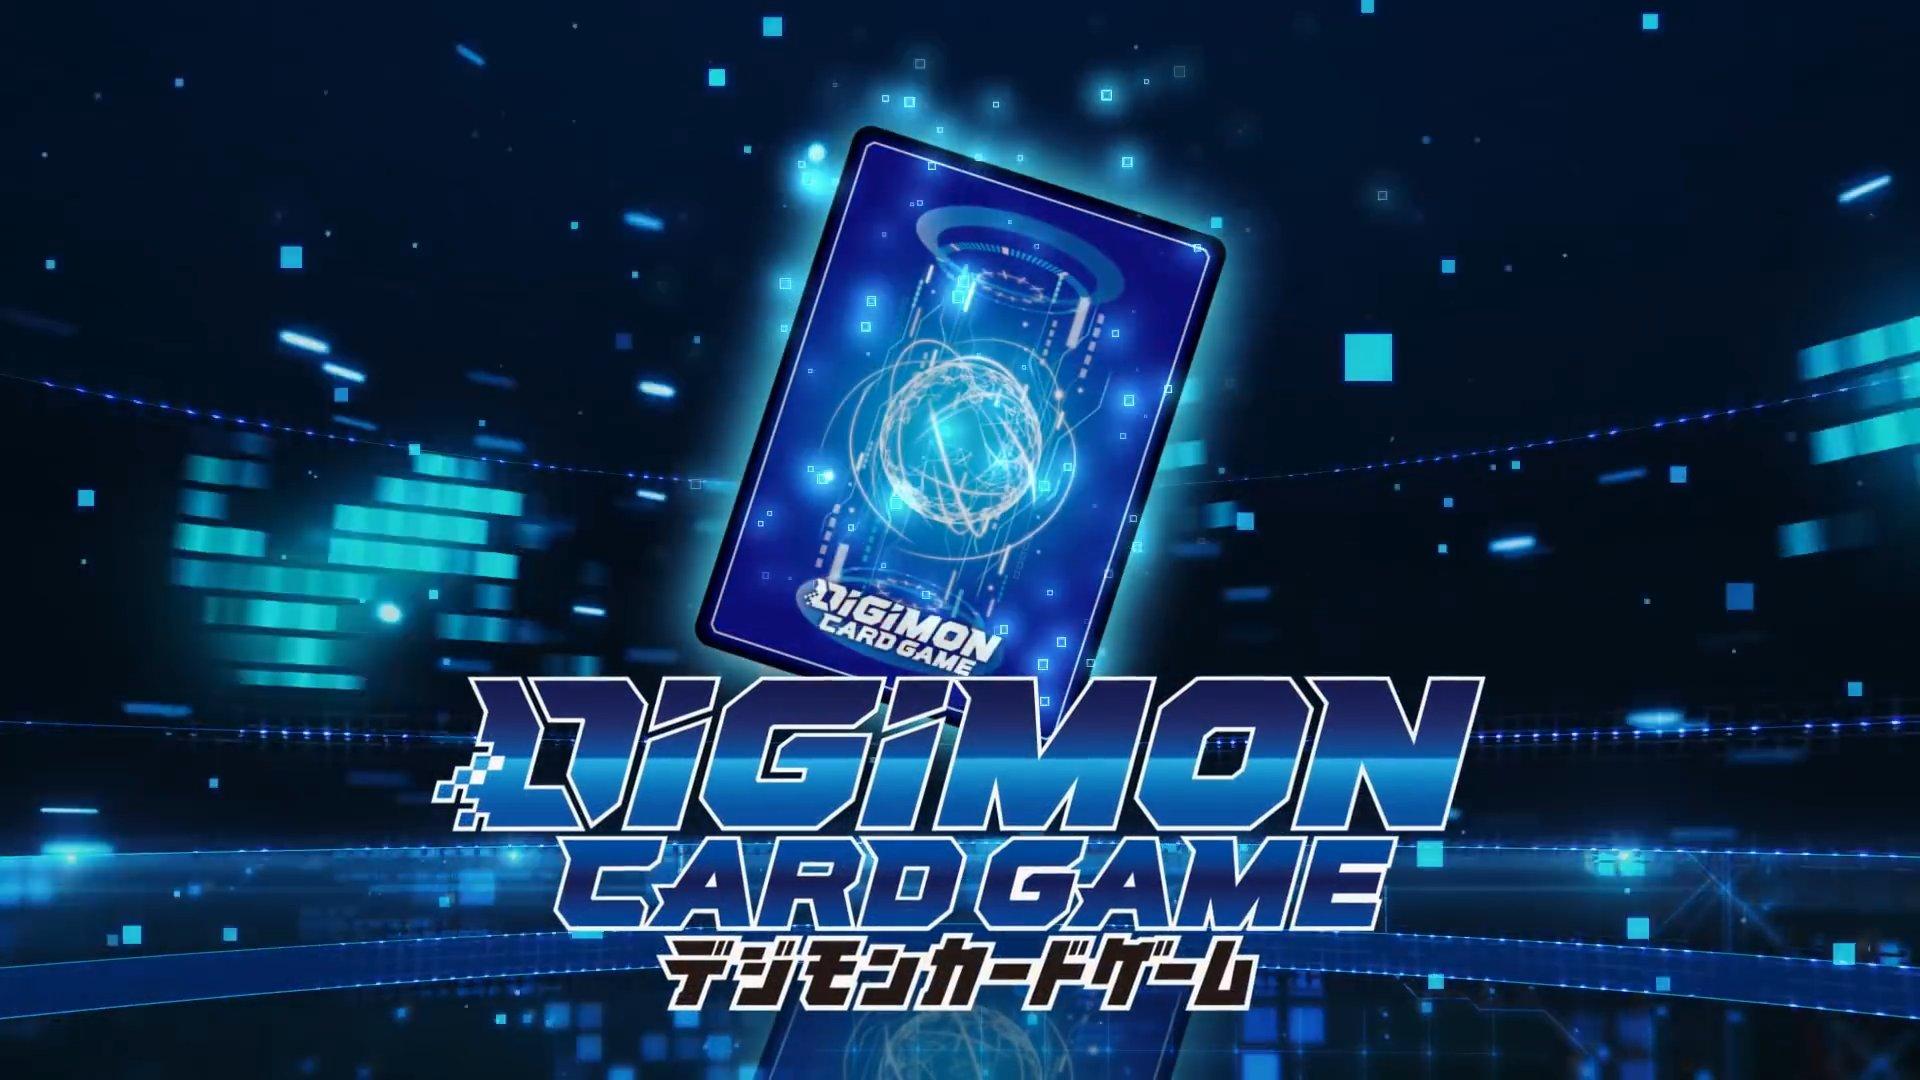 cardgamepromo01_march27_2020.jpg